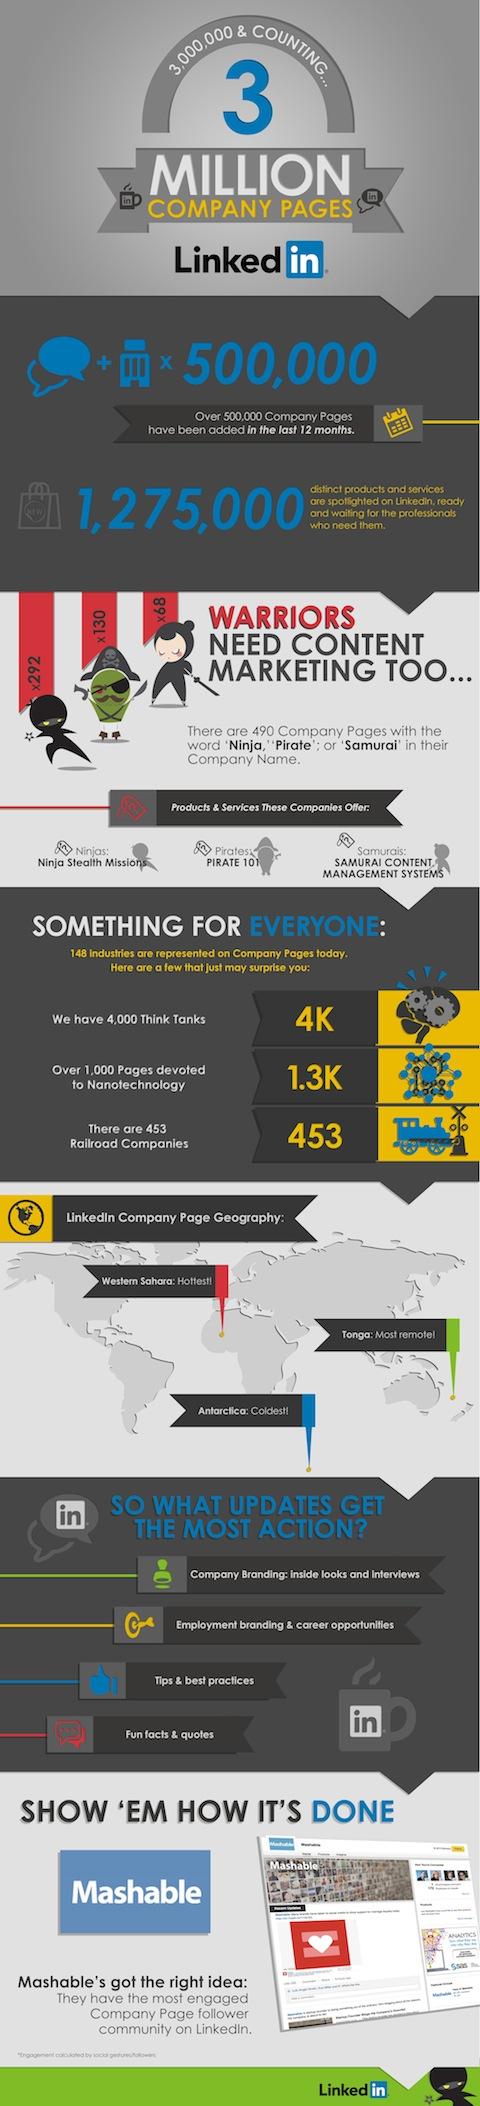 linkedin company page infographic